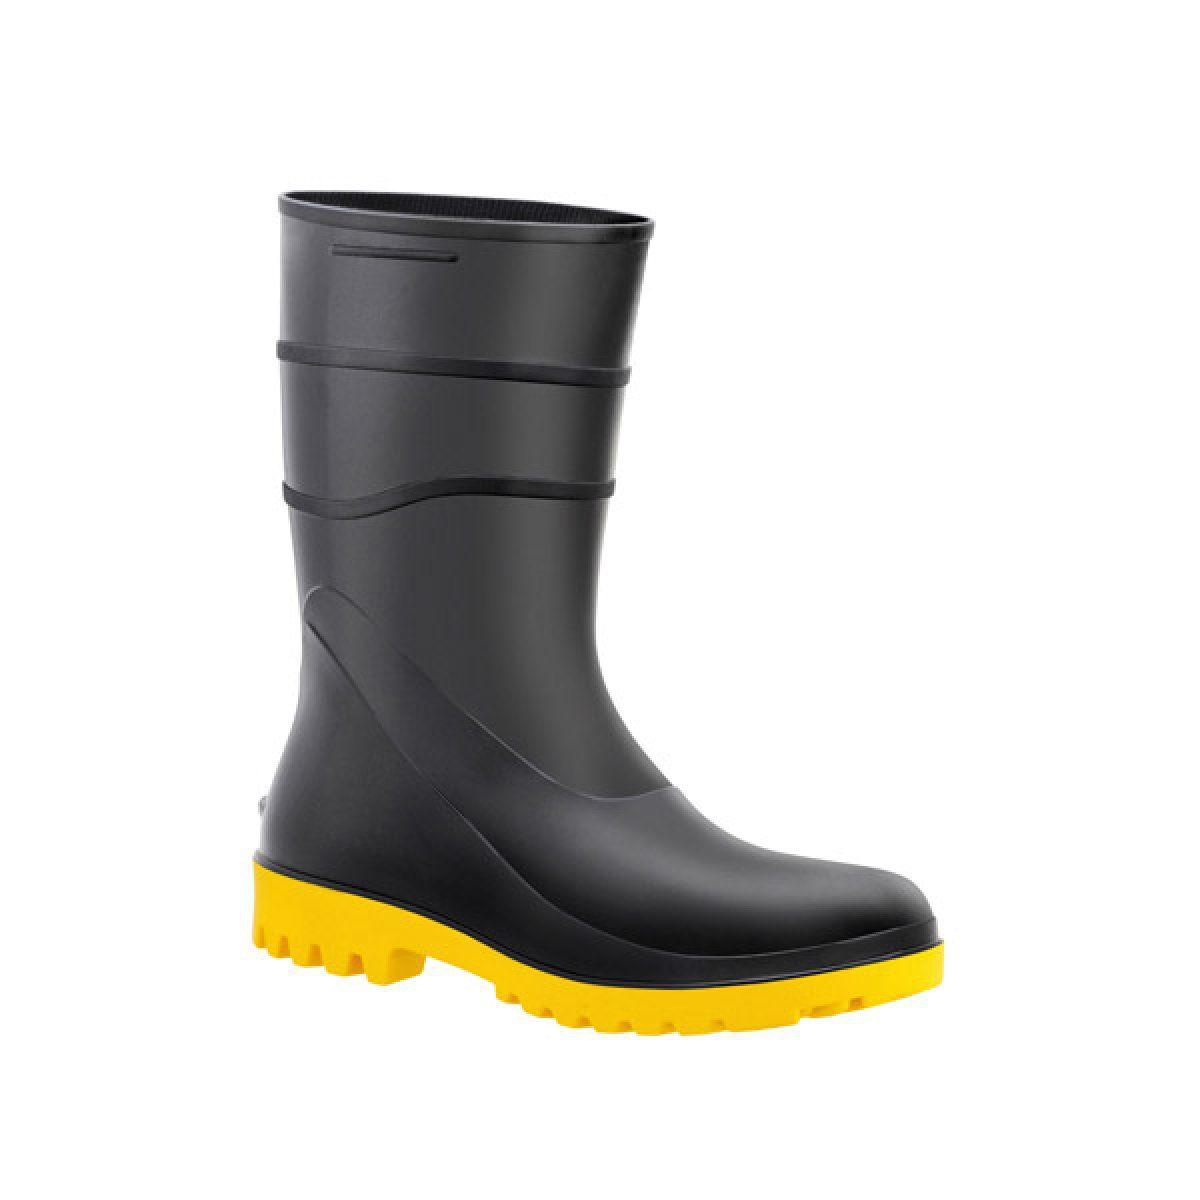 Bota de PVC Preta c/ Solado Amarelo N°36 - BRACOL